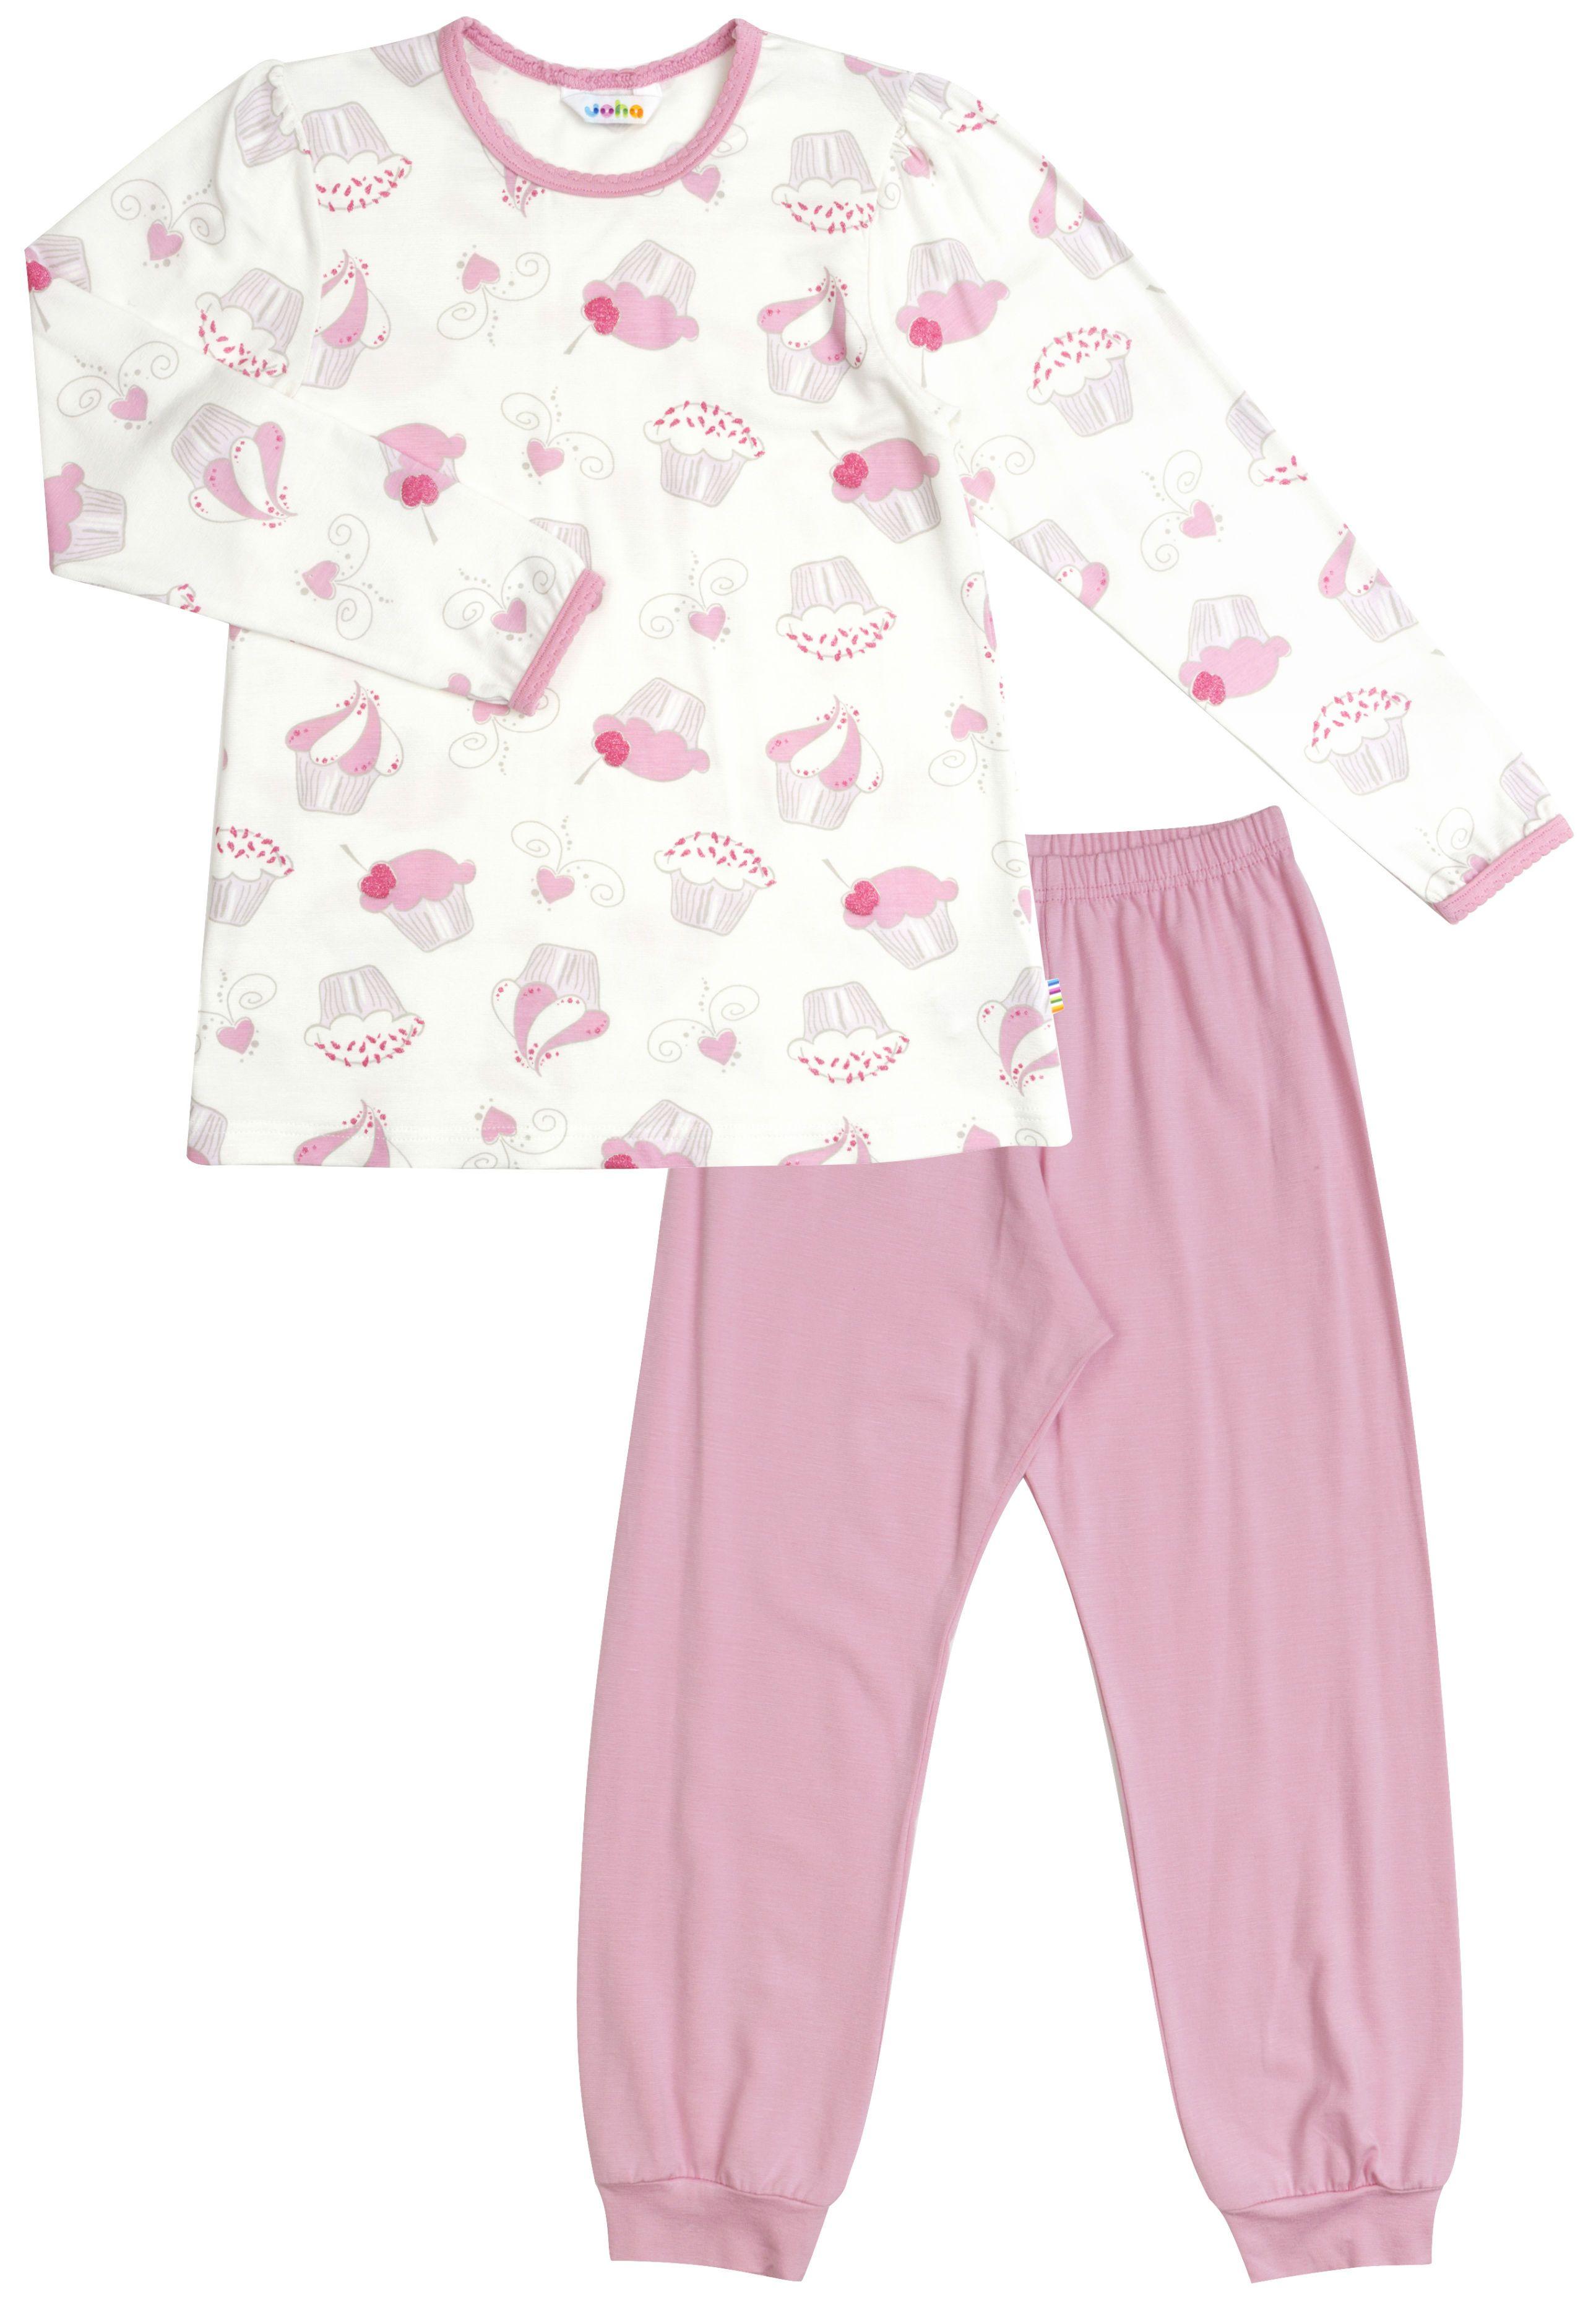 Image of Pyjamas fra Joha - Bambus - Cupcakes (58300-345-2268)